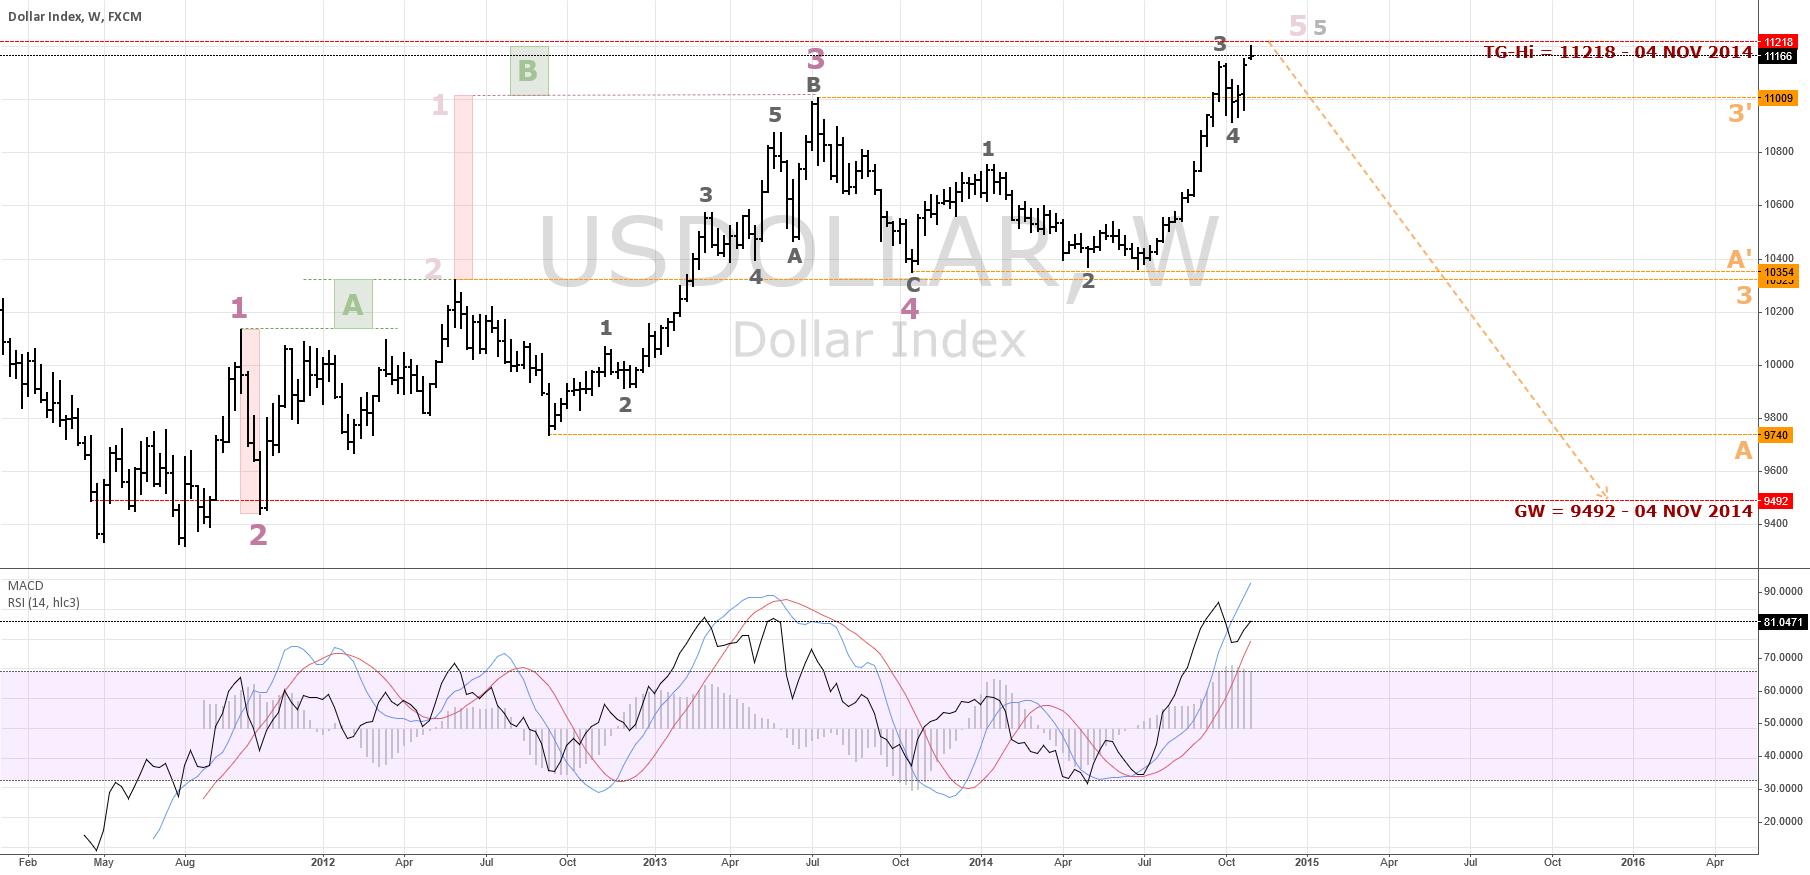 USDollar Index Scrapes Model